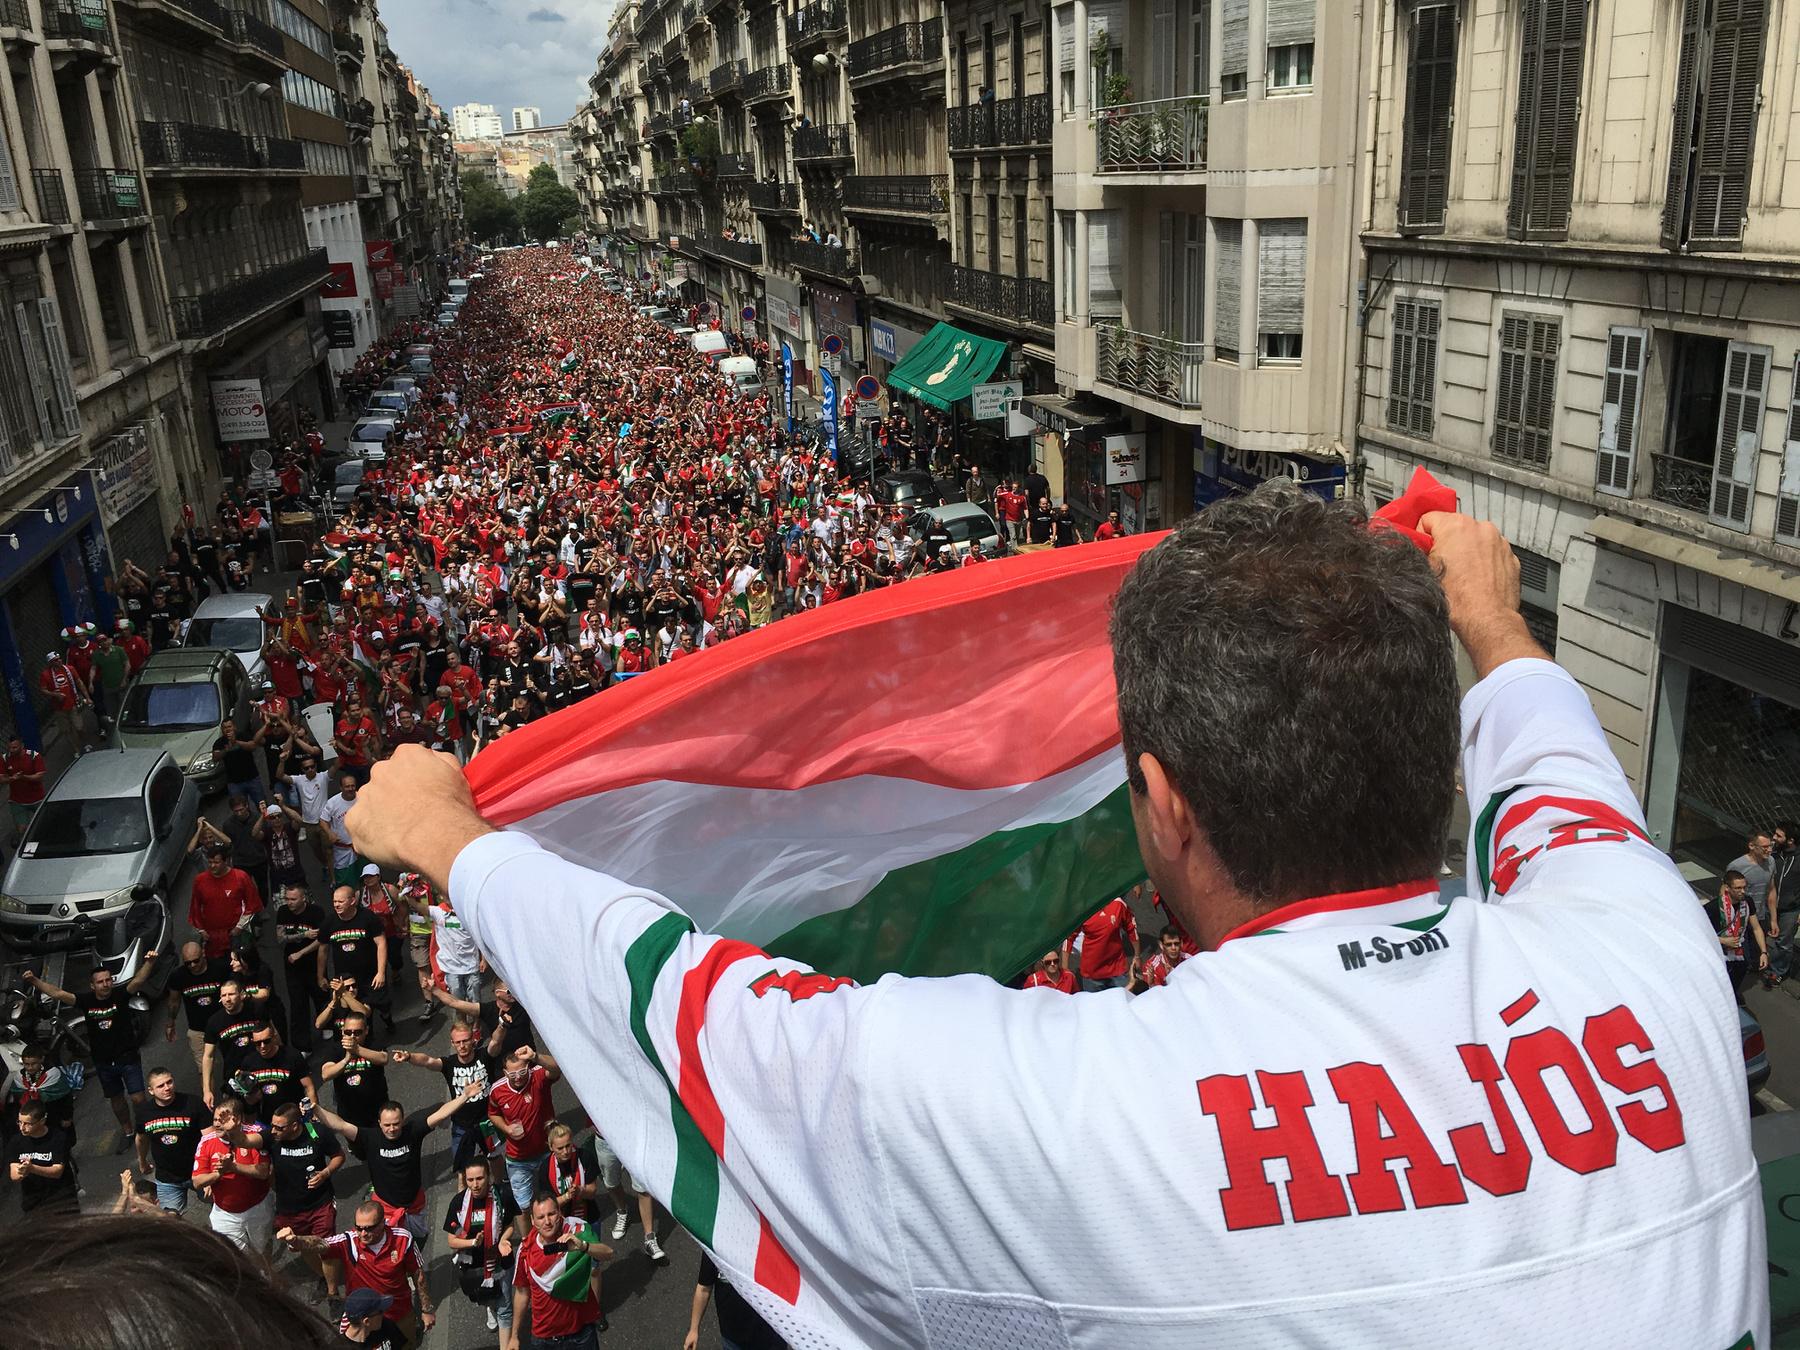 focieb_2016_magyarizland_magyar_szurkolok_marseilleben01.jpg